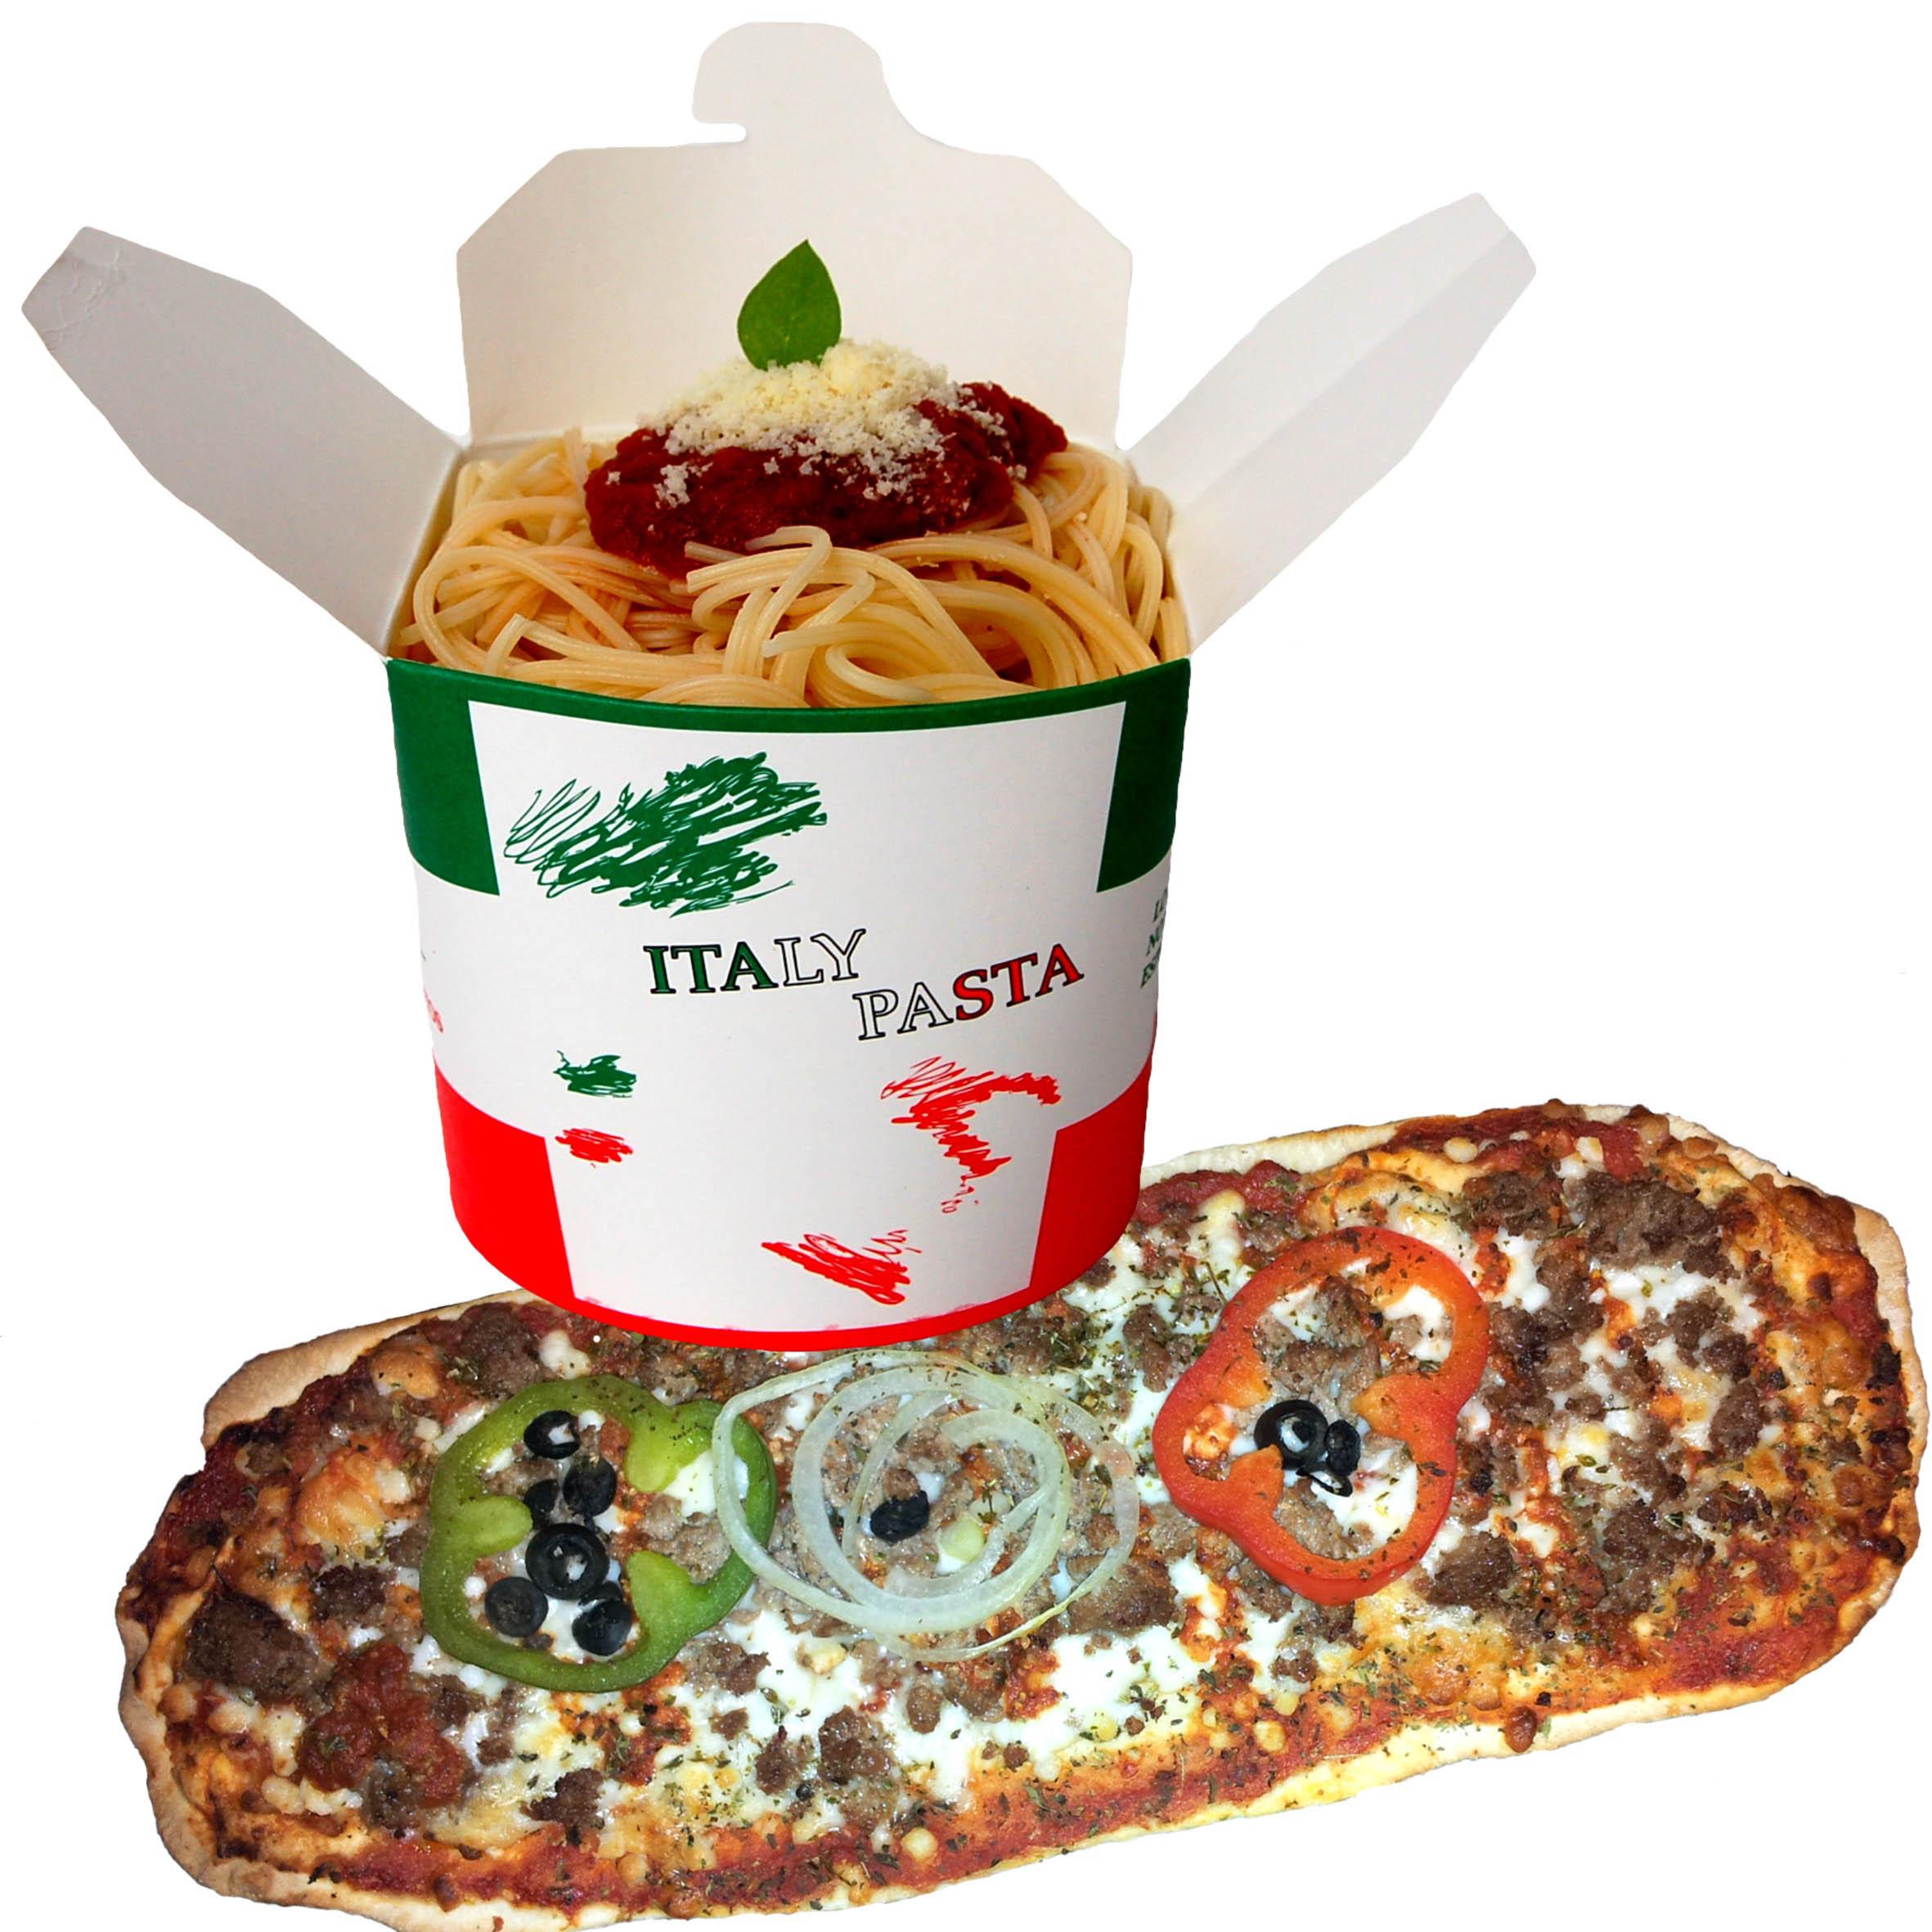 778ab1a275 Italy Pasta Italy Pasta Italy Pasta